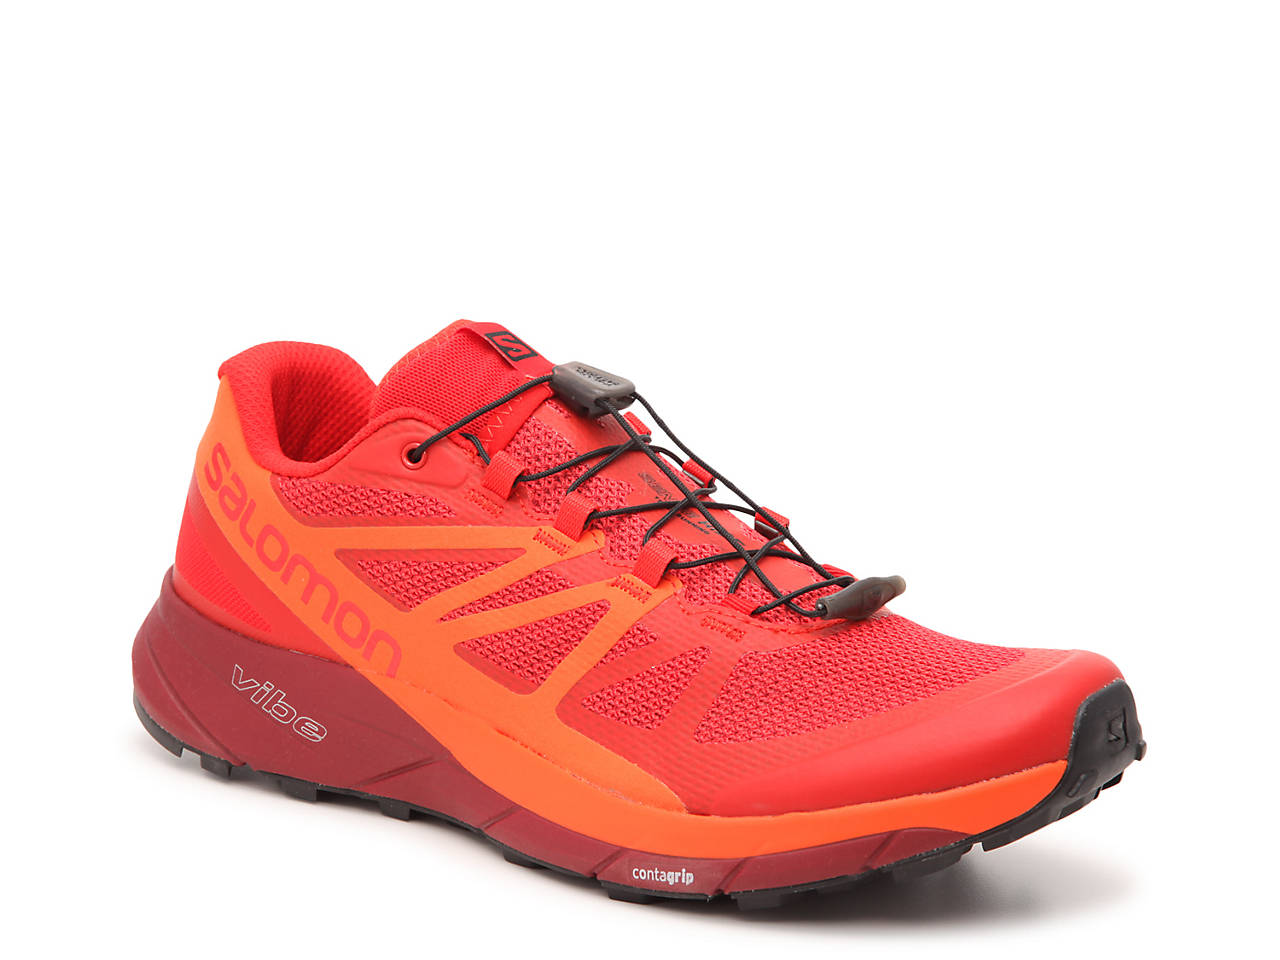 premium selection 29b0a b060a Sense Ride Trail Running Shoe